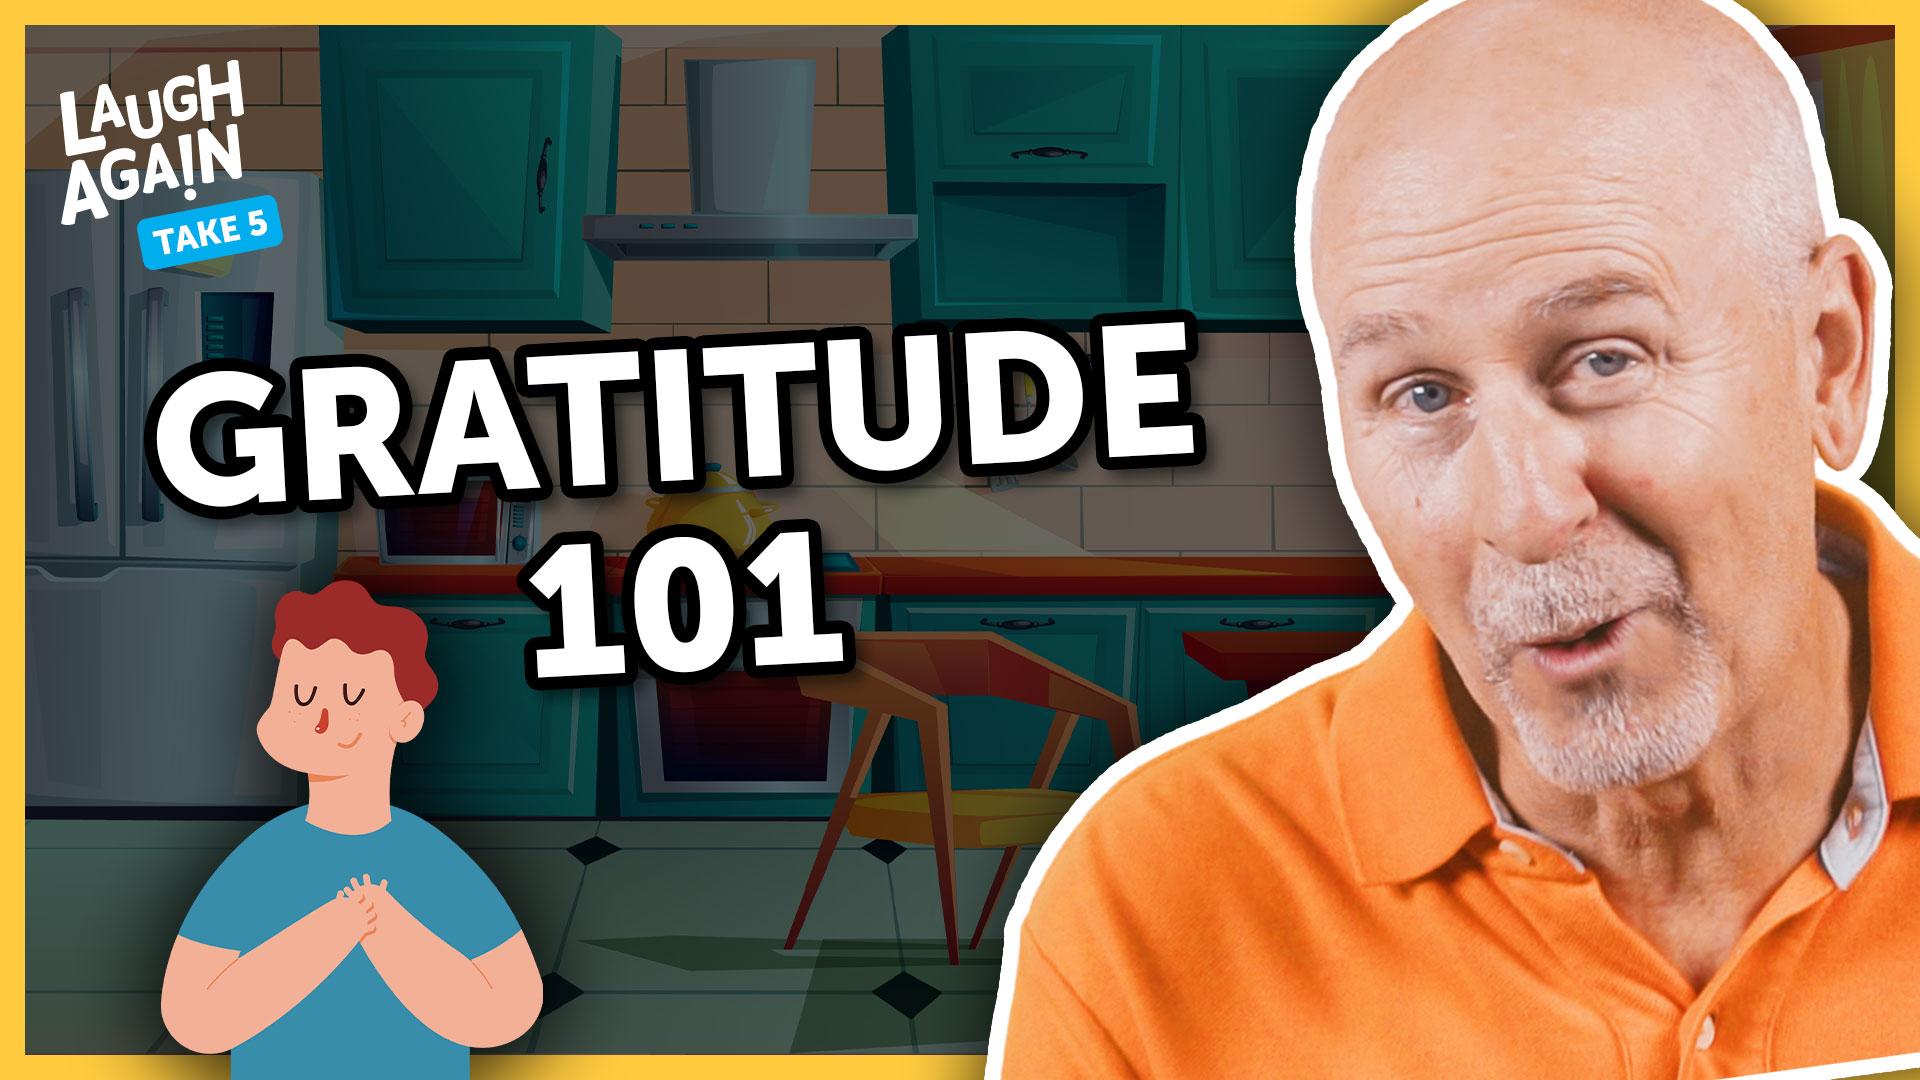 Gratitude 101 - Laugh Again Take 5